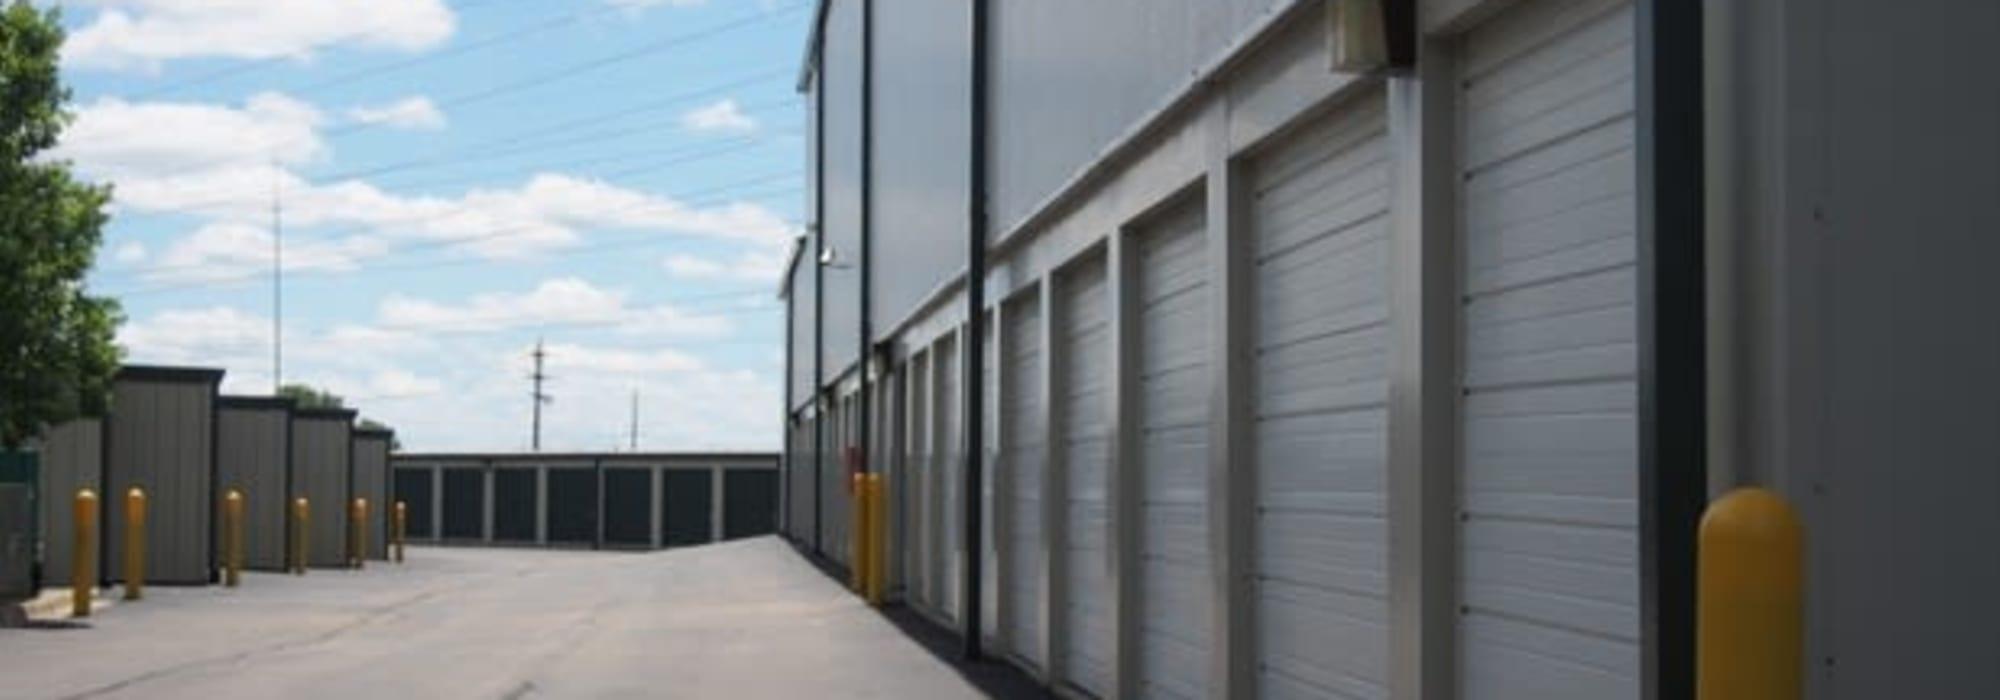 Drive-up Storage units at Michigan Storage Centers in Farmington Hills, Michigan